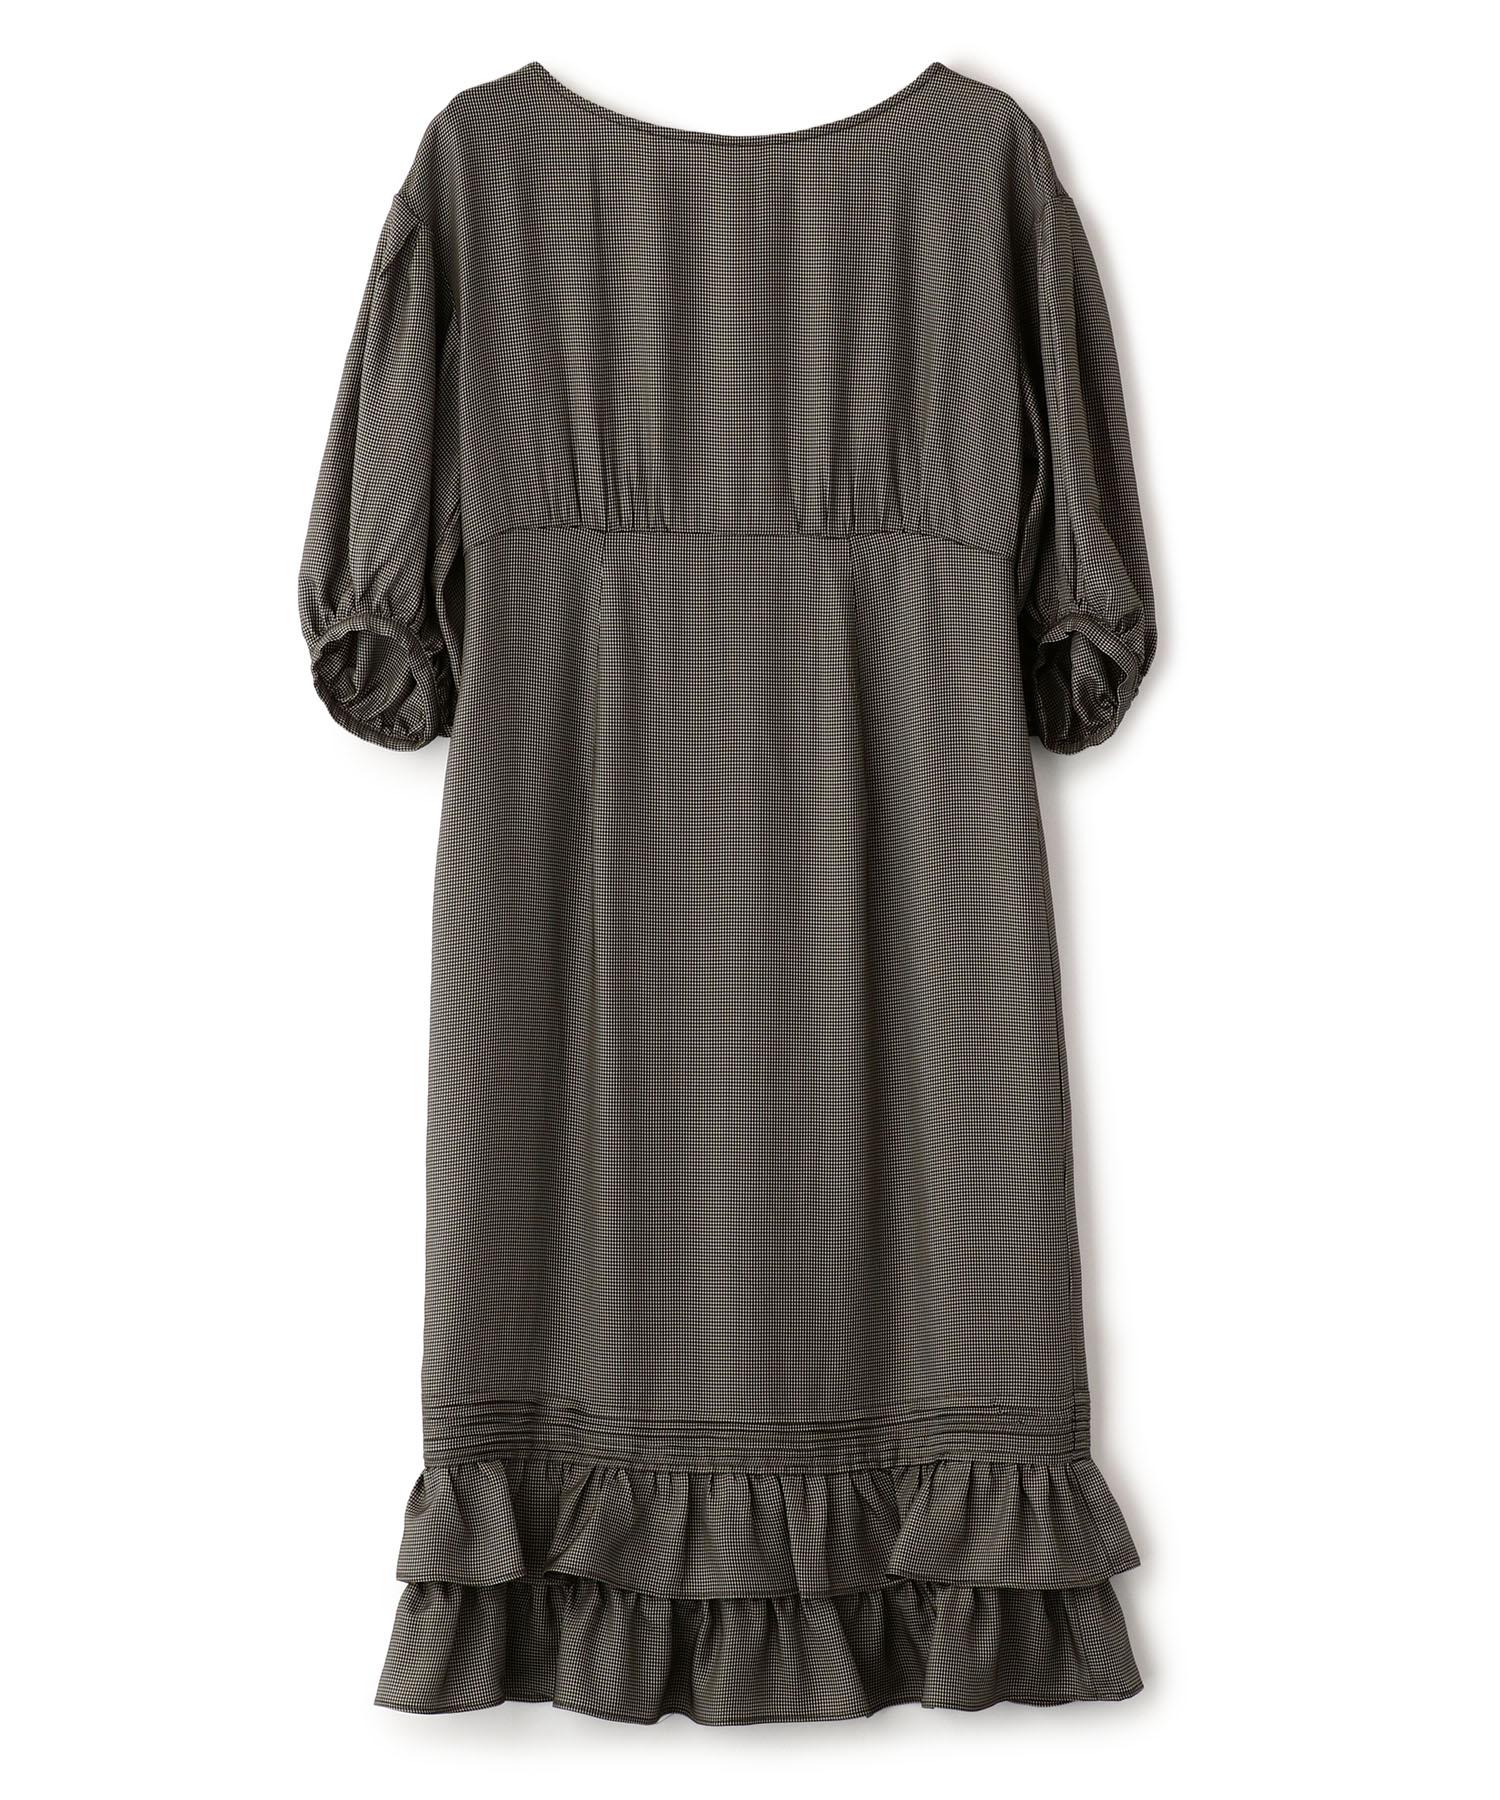 Hem Frill Houndstooth Check Dress